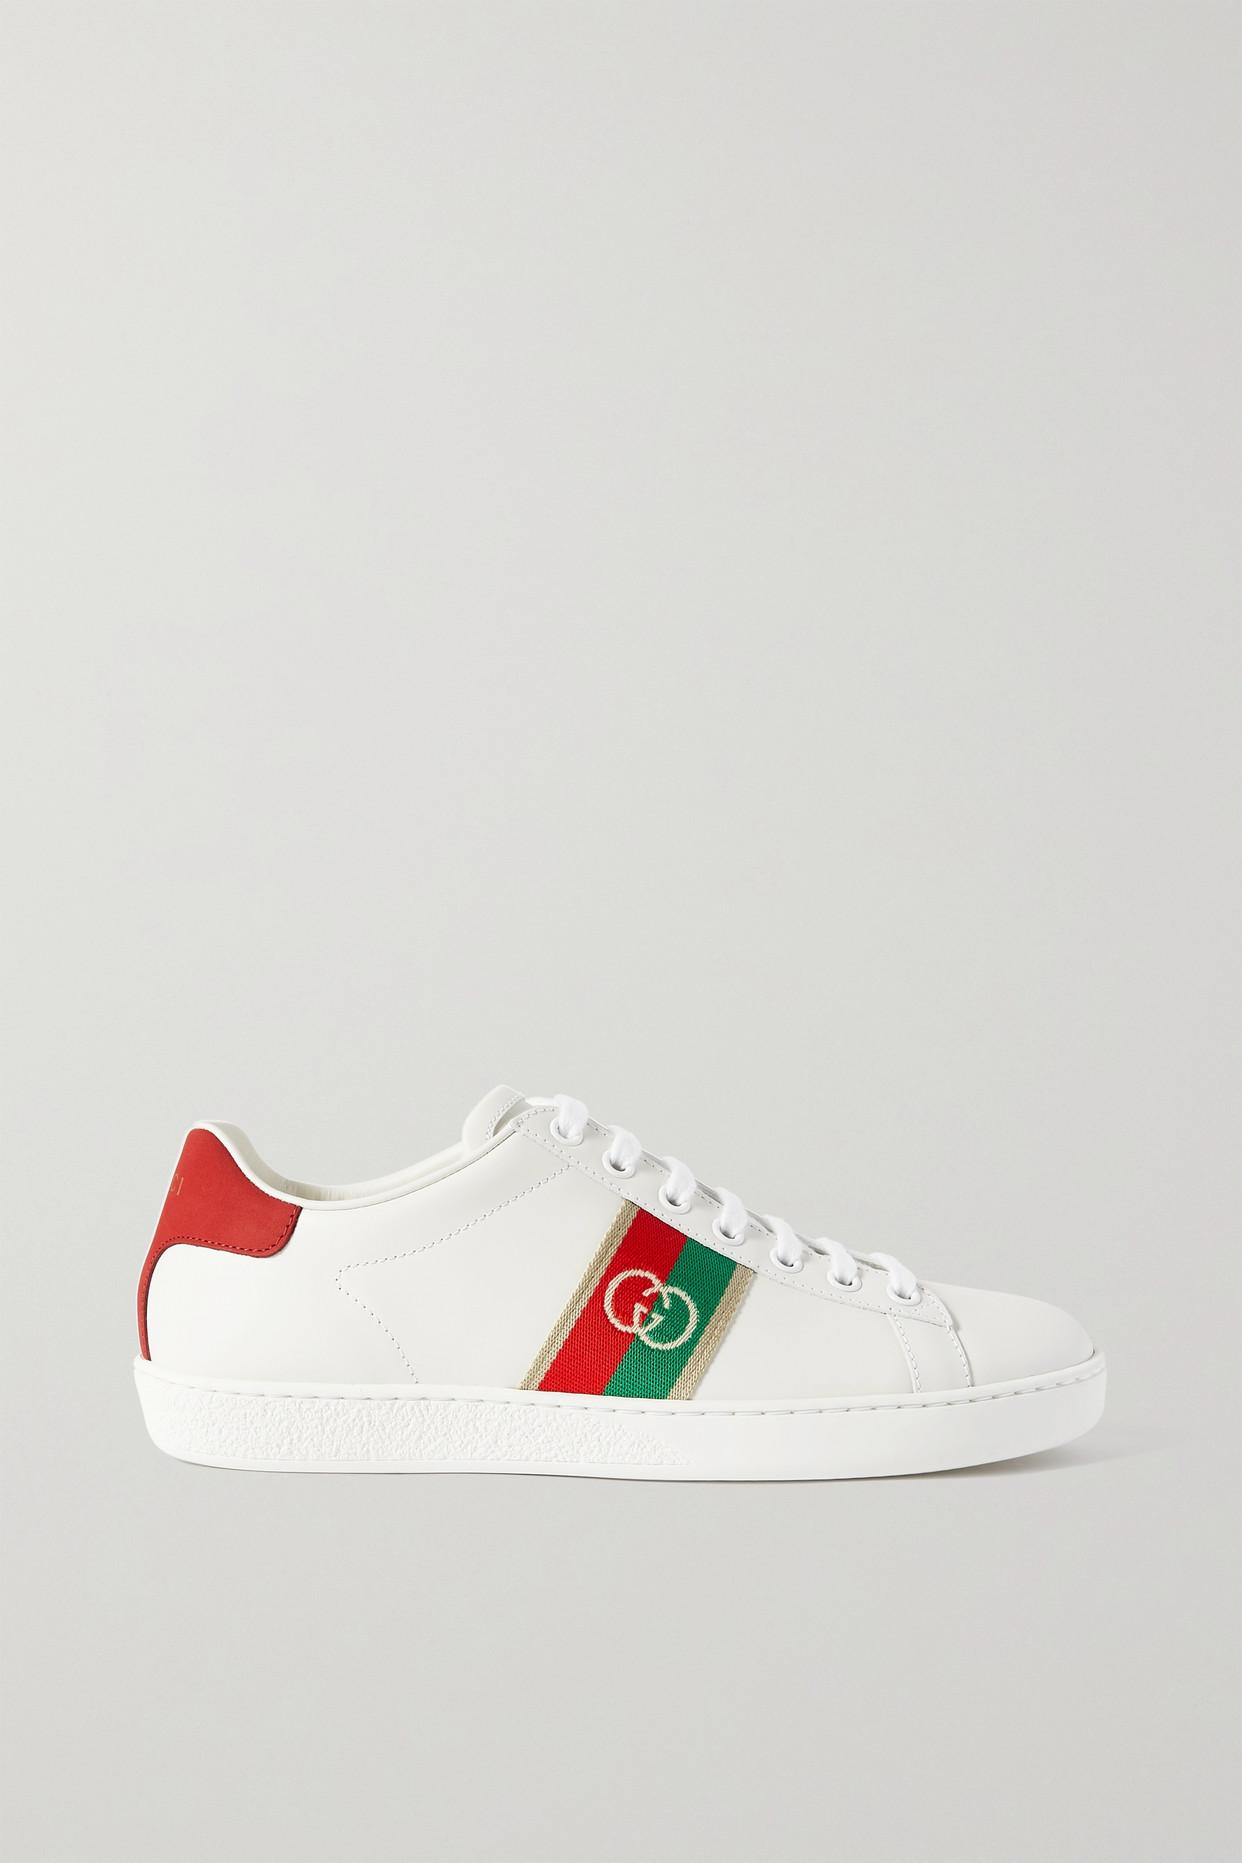 GUCCI - Ace 织带边饰皮革运动鞋 - 白色 - IT37.5